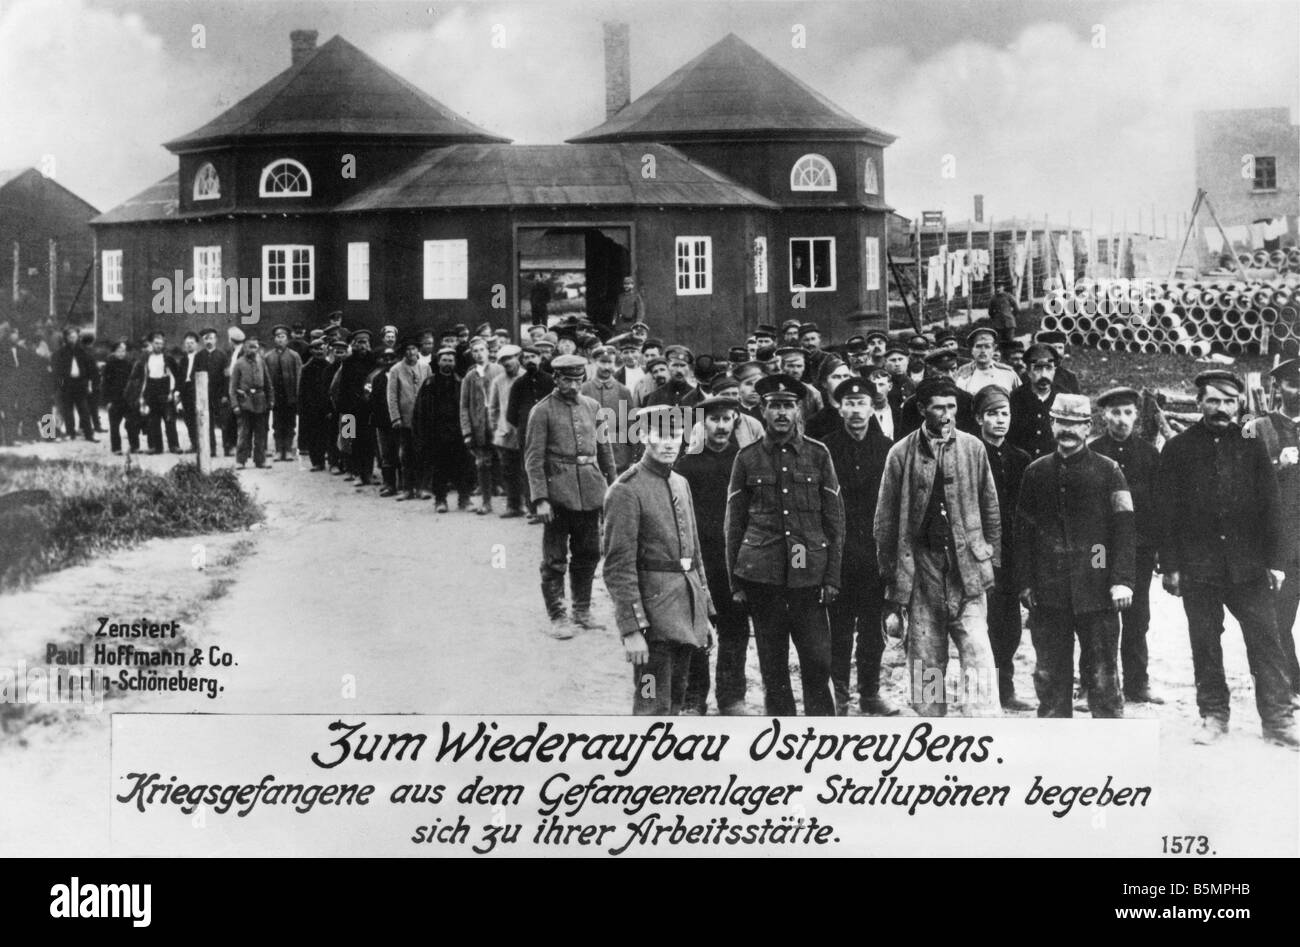 9 1916 0 0 A3 E Kriegsgefangene in Stalluponen Camp Weltkrieg 1 Kriegsgefangene in Gefangenen in Ostpreußen Stockbild